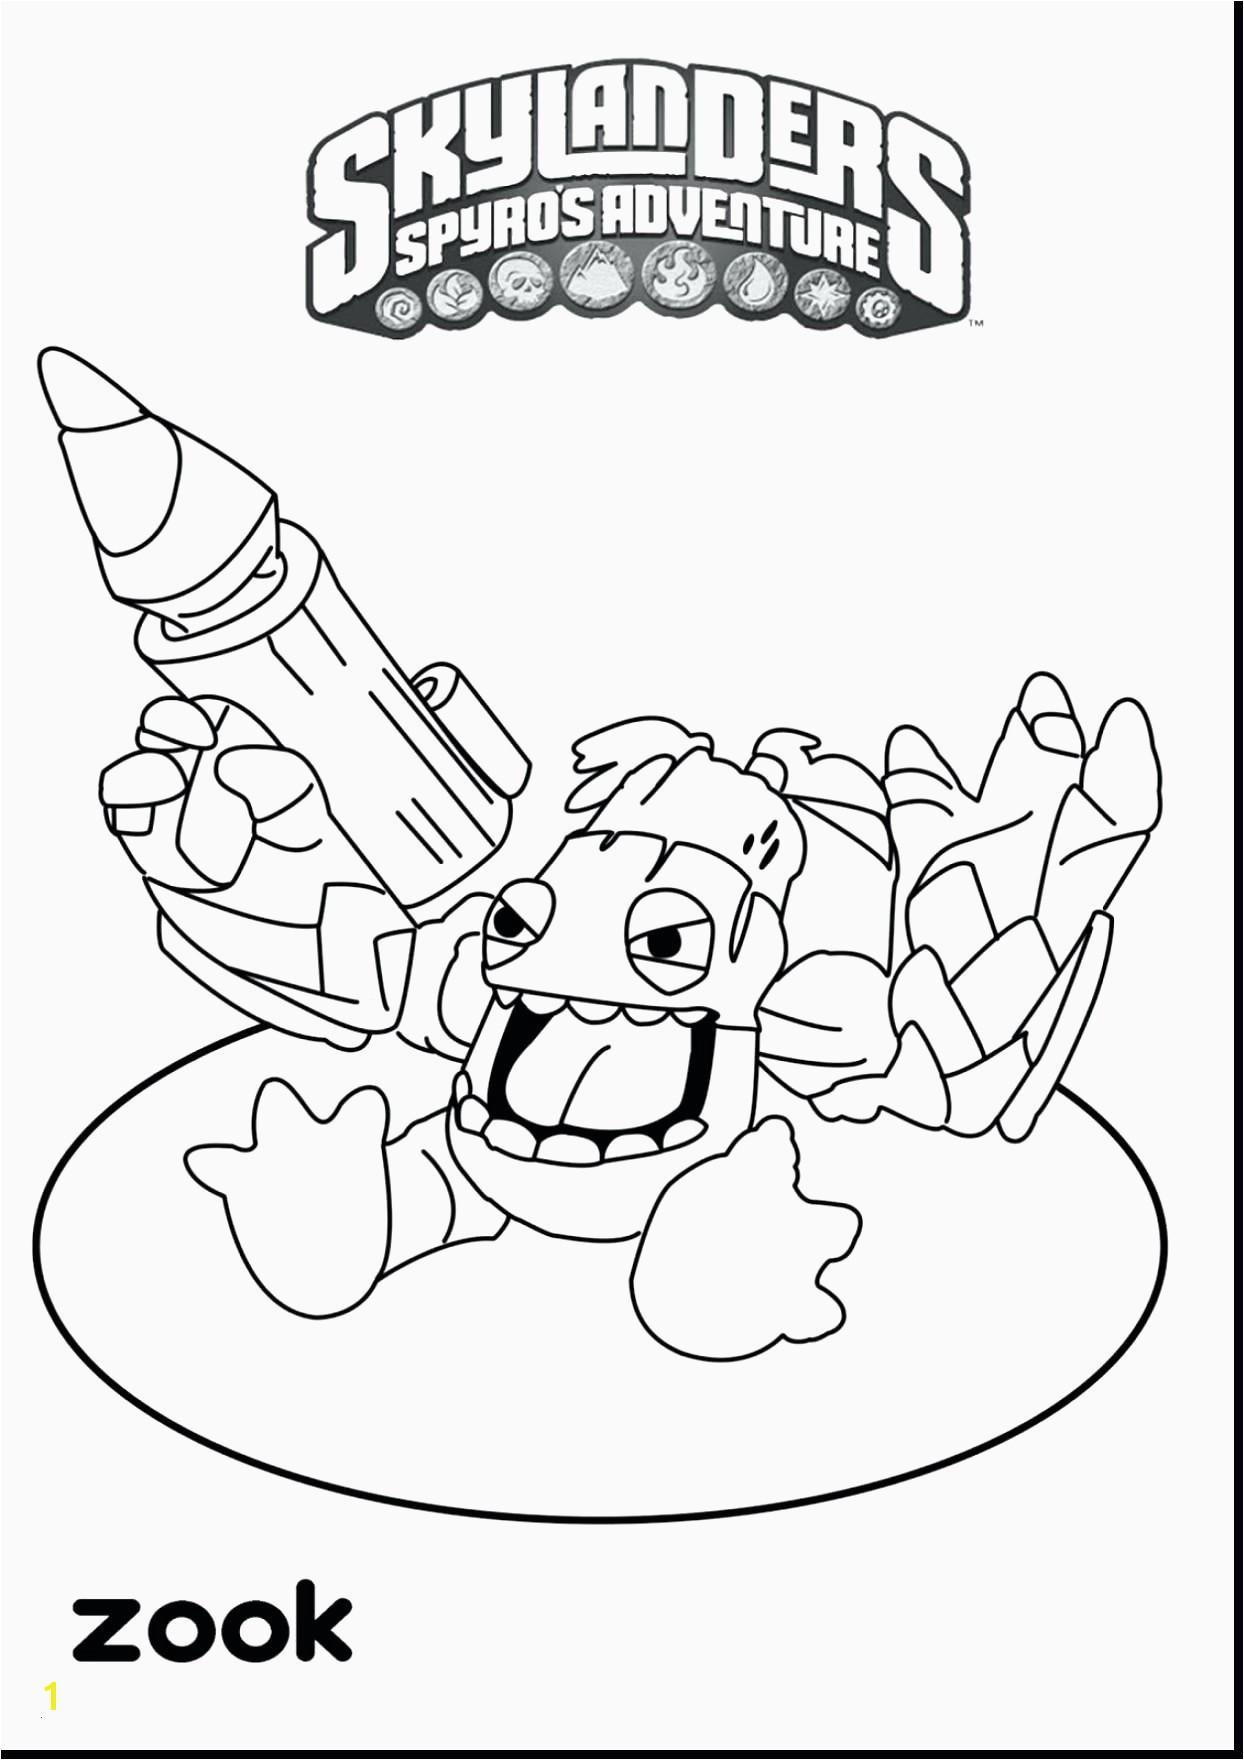 Freddy Krueger Coloring Pages Freddy Krueger Coloring Page Elegant Coloring Pages Football Luxury